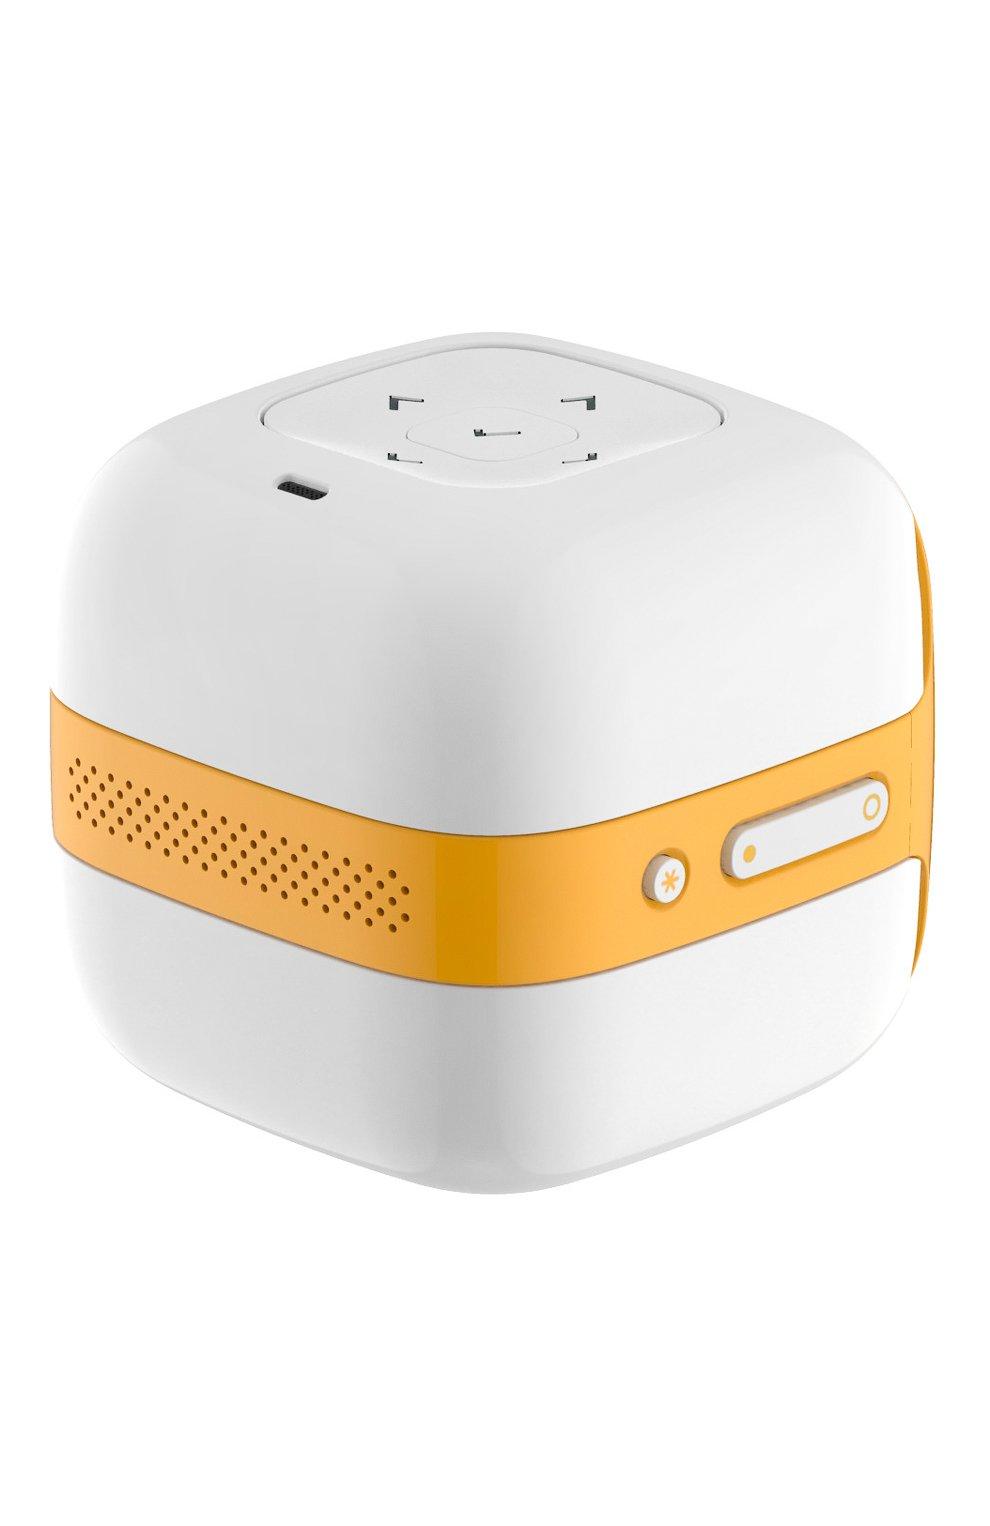 Портативный проектор диакубик 3м draft CINEMOOD белого цвета, арт. CNMD0016LE-3M   Фото 2